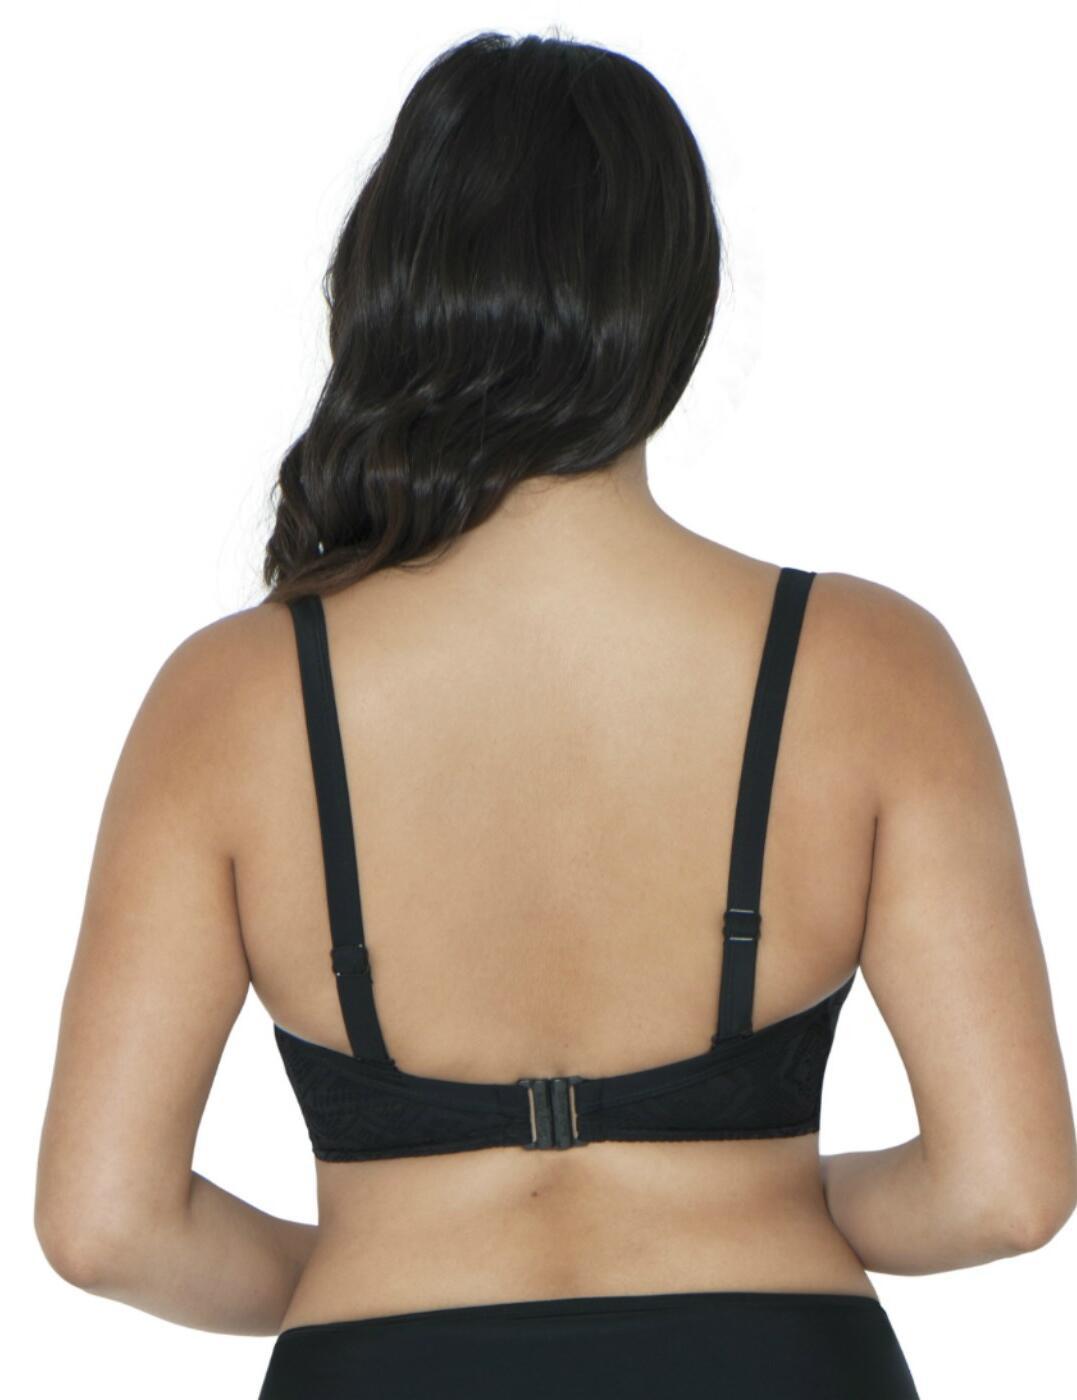 Curvy Kate Swimwear Rush Underwired Padded Plunge Bikini Top Black